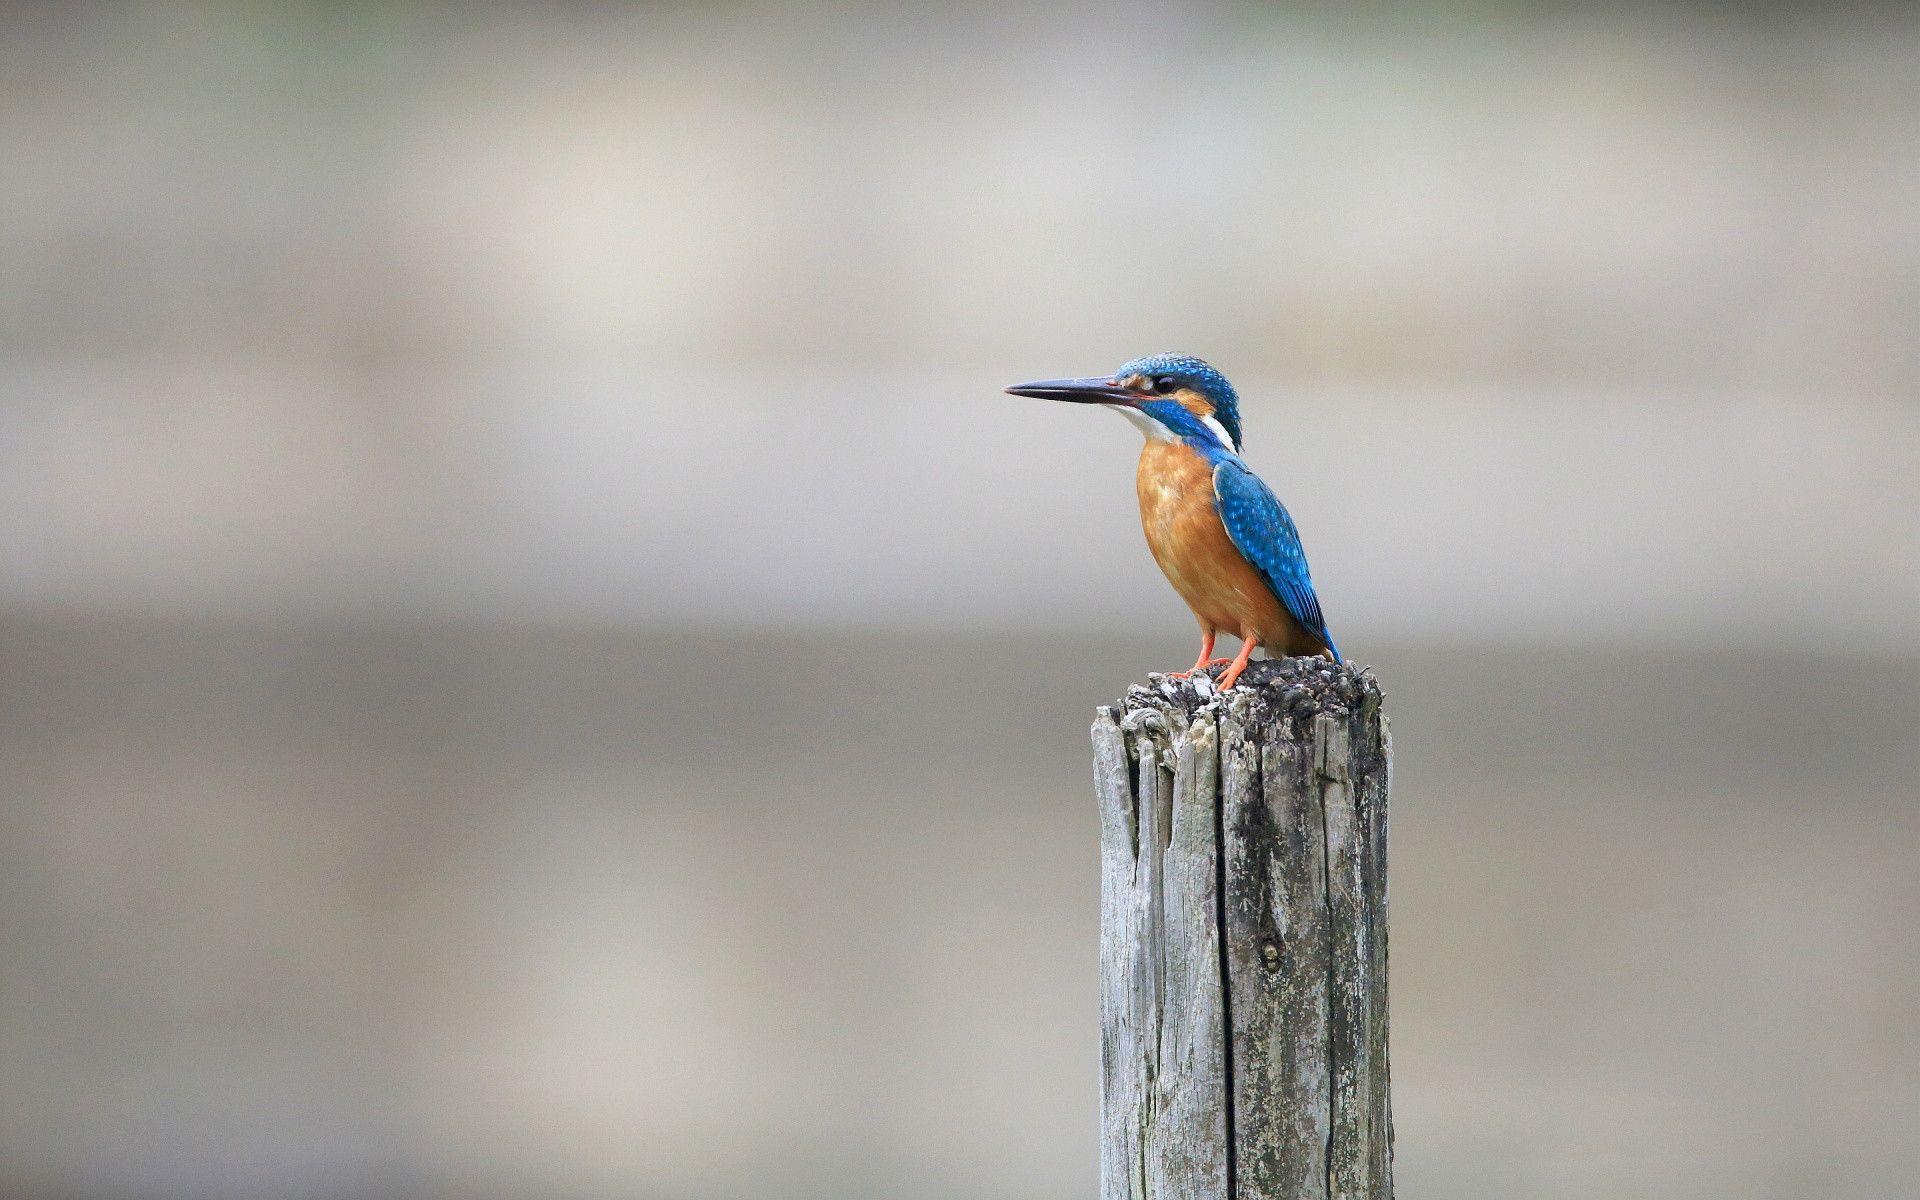 kingfisher wallpapers hd - photo #12